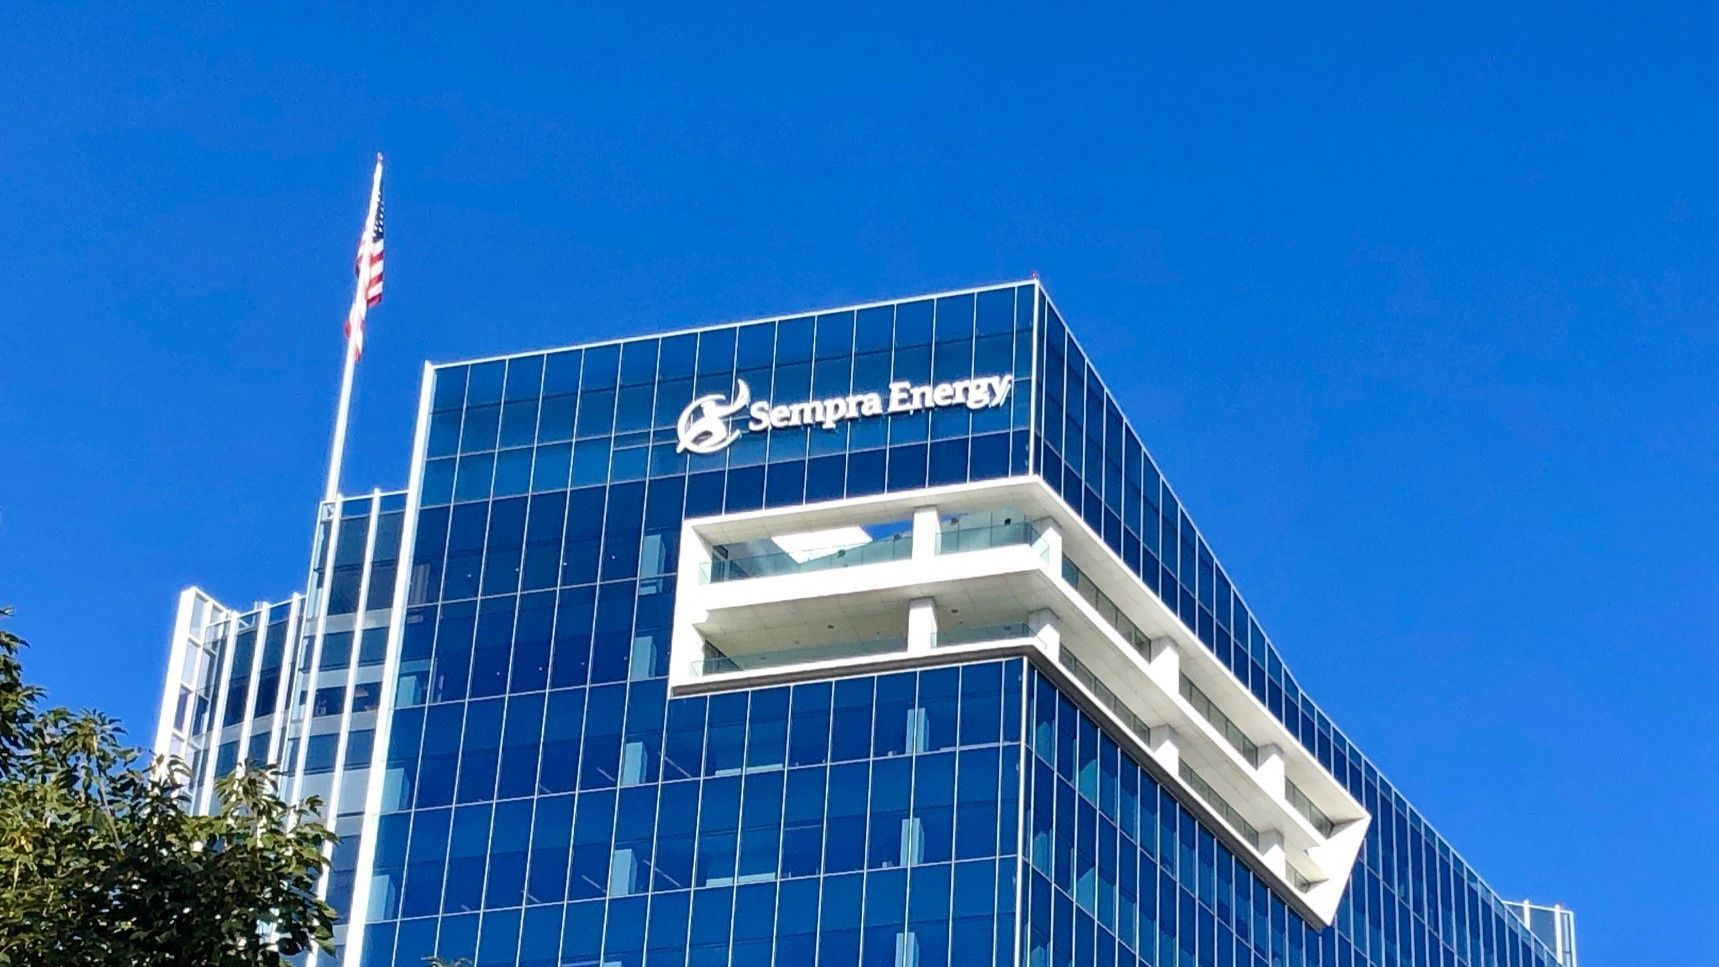 Sempra bumps PG&E, moves into the Dow Jones Utility Average   San Diego Union Tribune